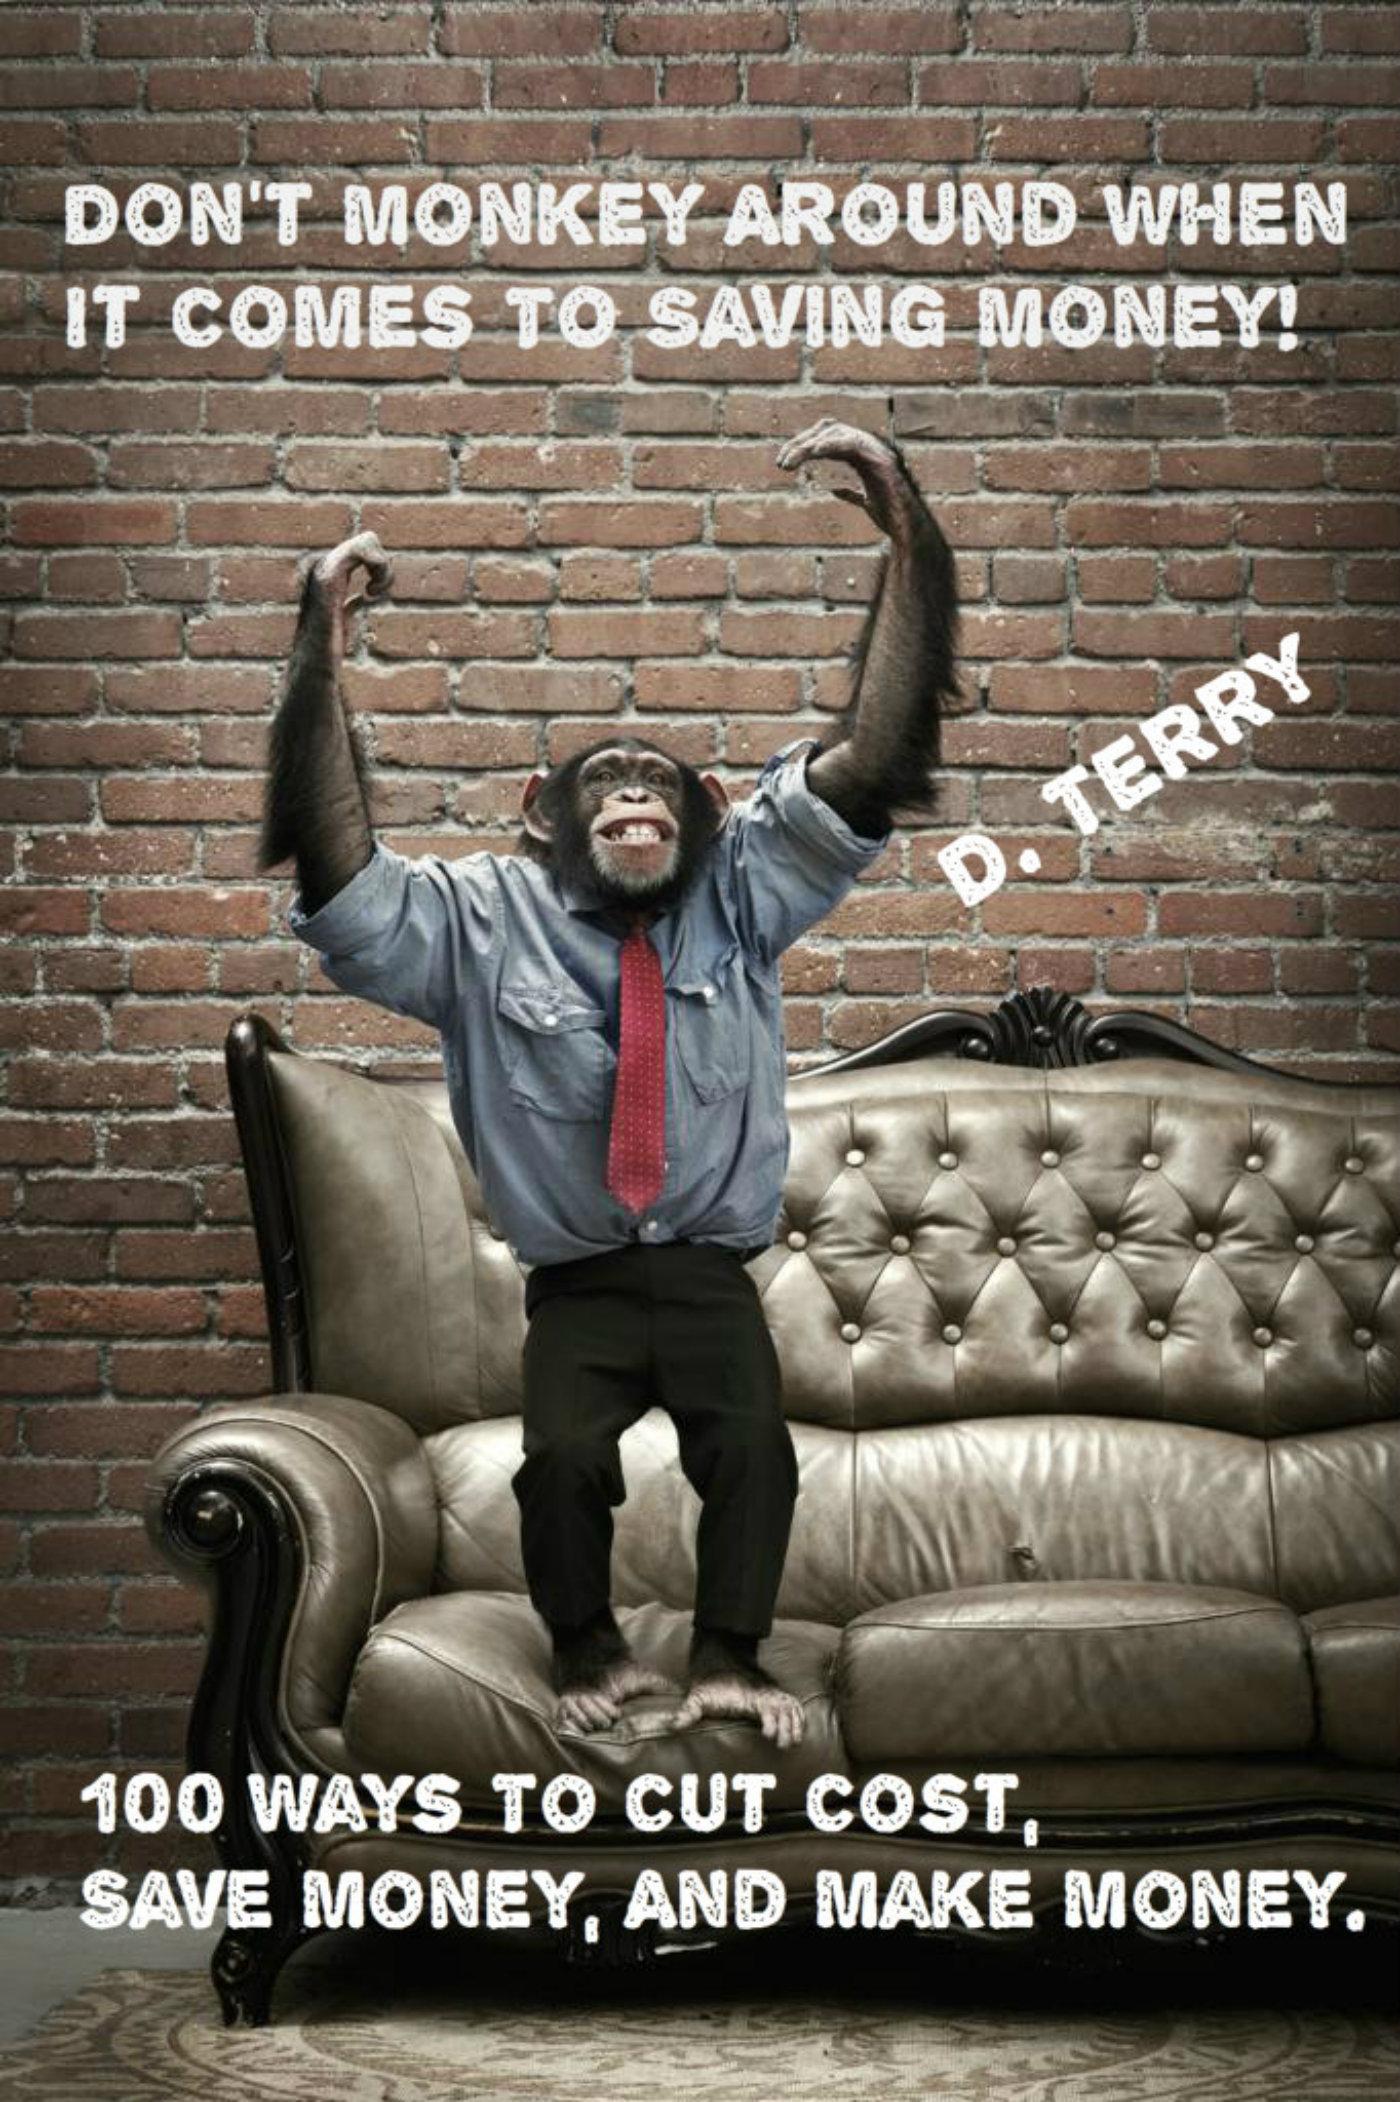 Don't Monkey Around When It Comes to Saving Money!